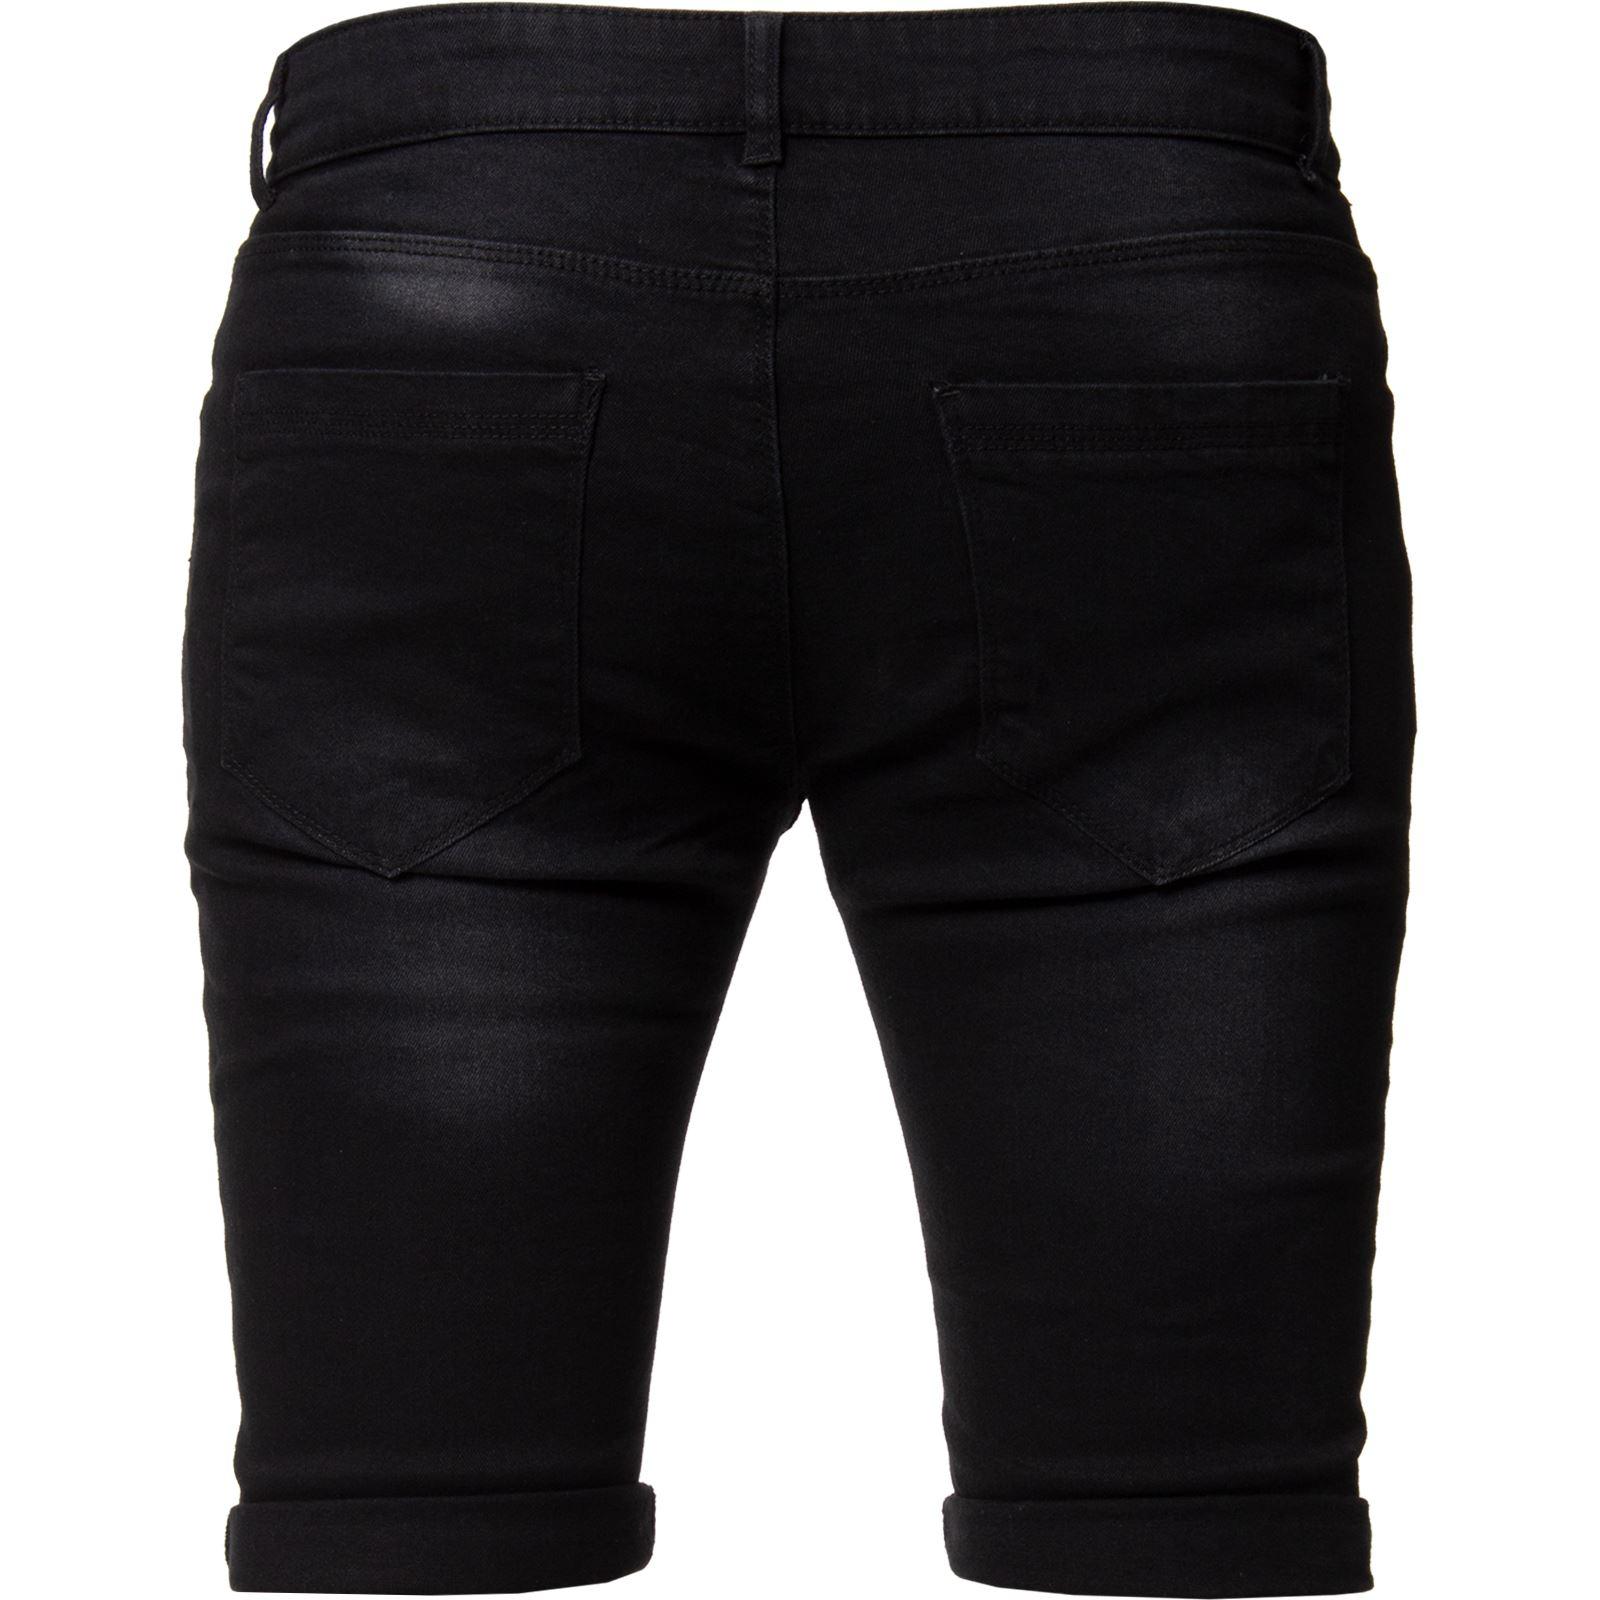 Kruze Mens Skinny Slim Fit Stretch Ripped Shorts Summer Denim Half Jean Pants